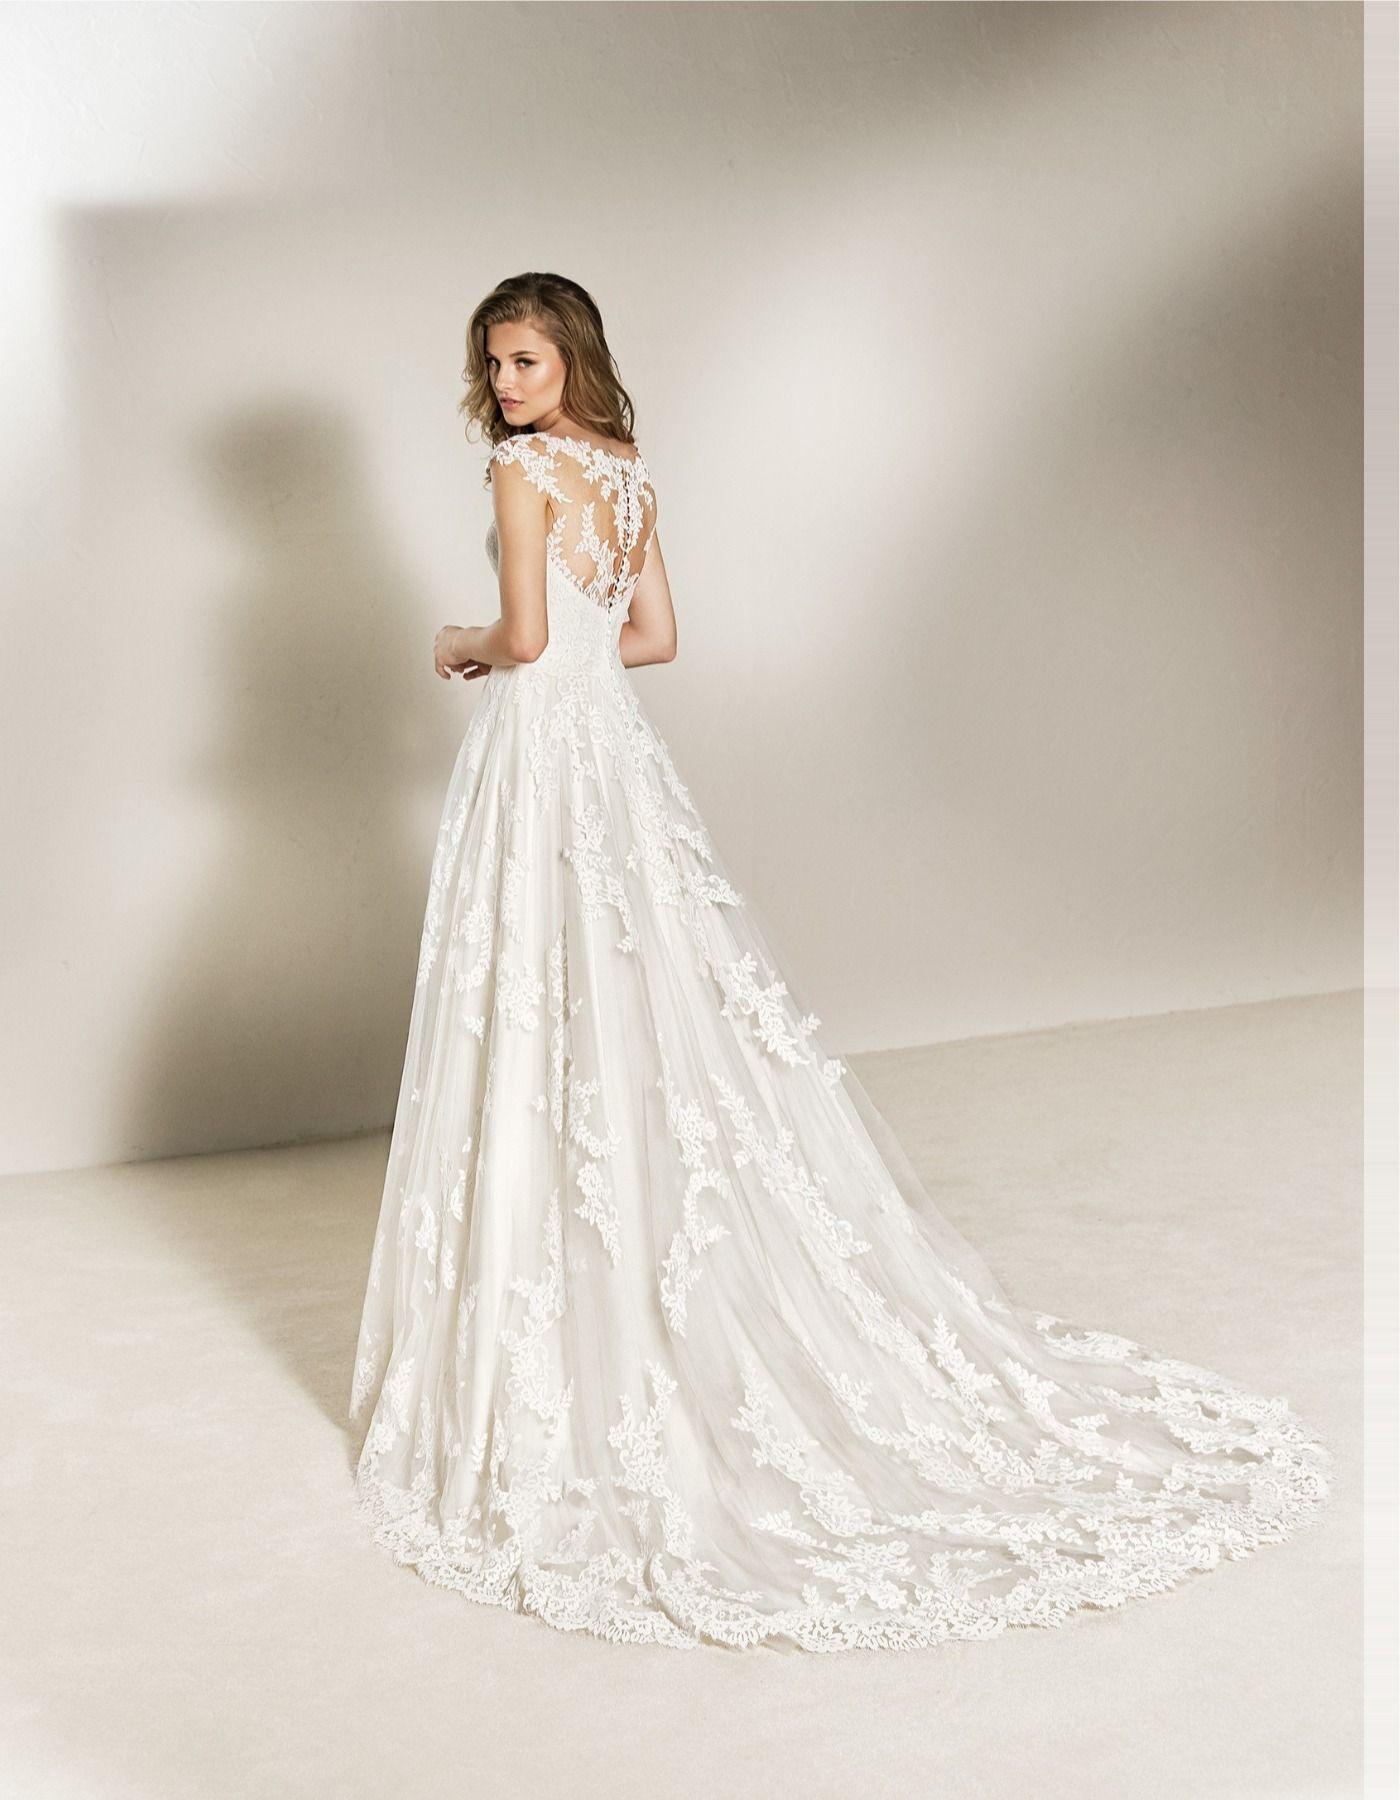 Charlotte Pronovias Wedding Dress Short Wedding Gowns Wedding Dresses [ 1800 x 1400 Pixel ]